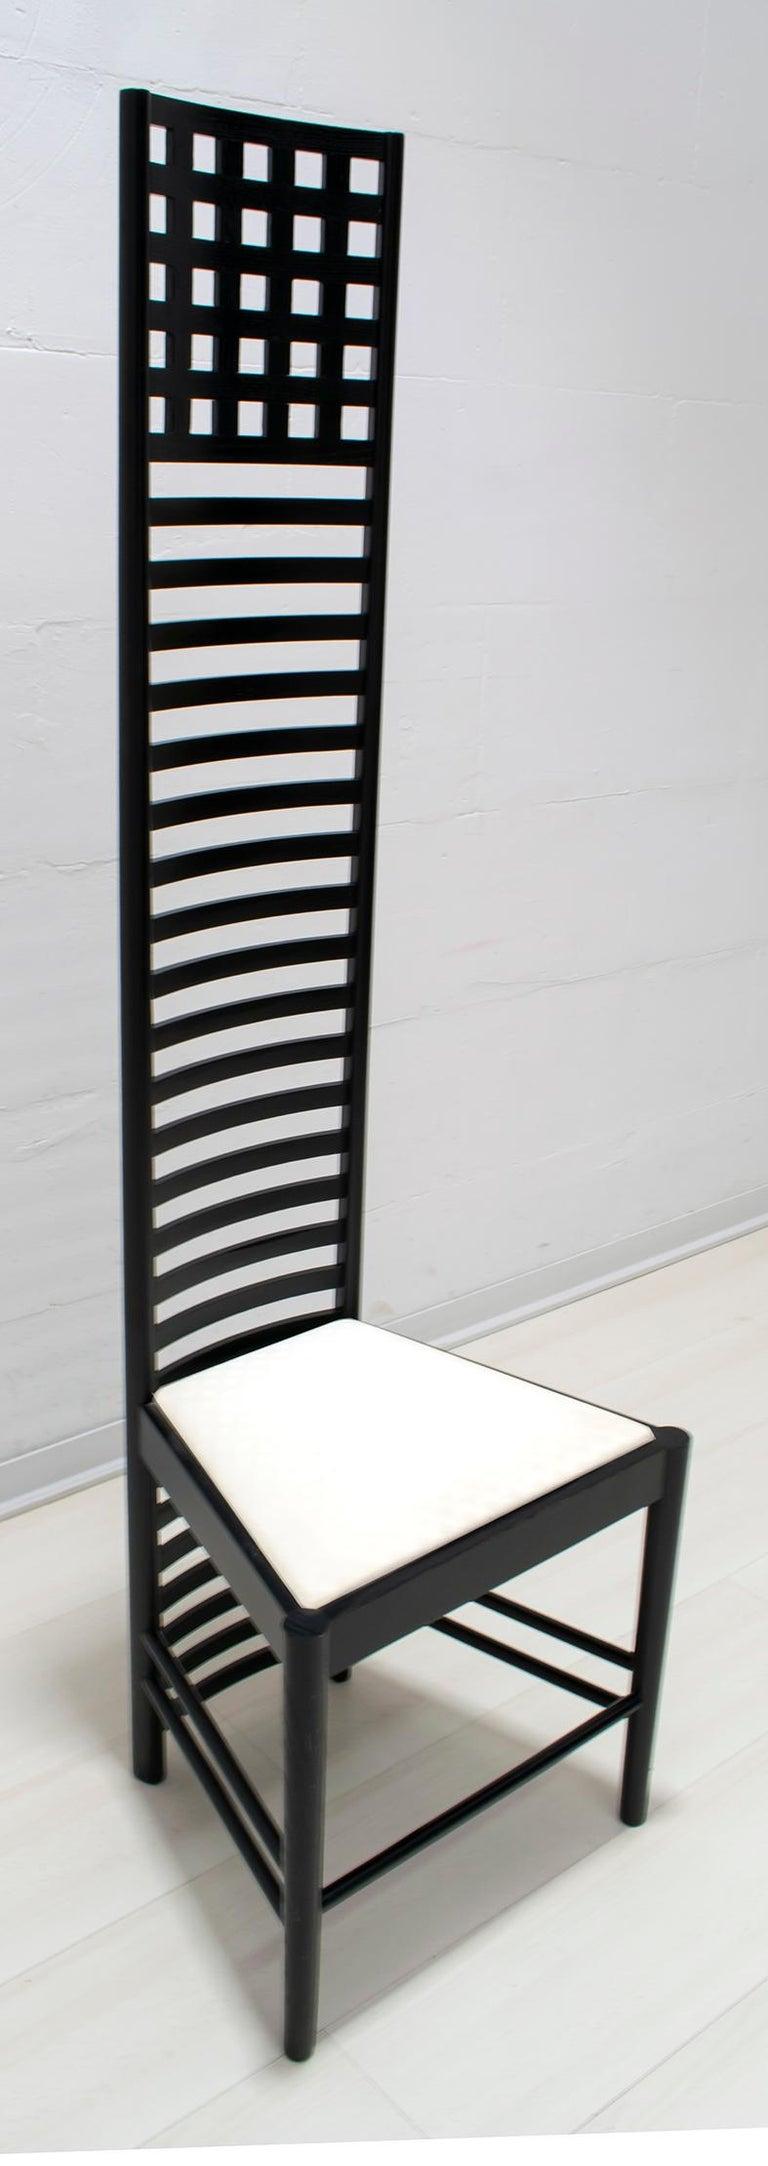 Art Nouveau Charles Rennie Mackintosh High Back Chairs